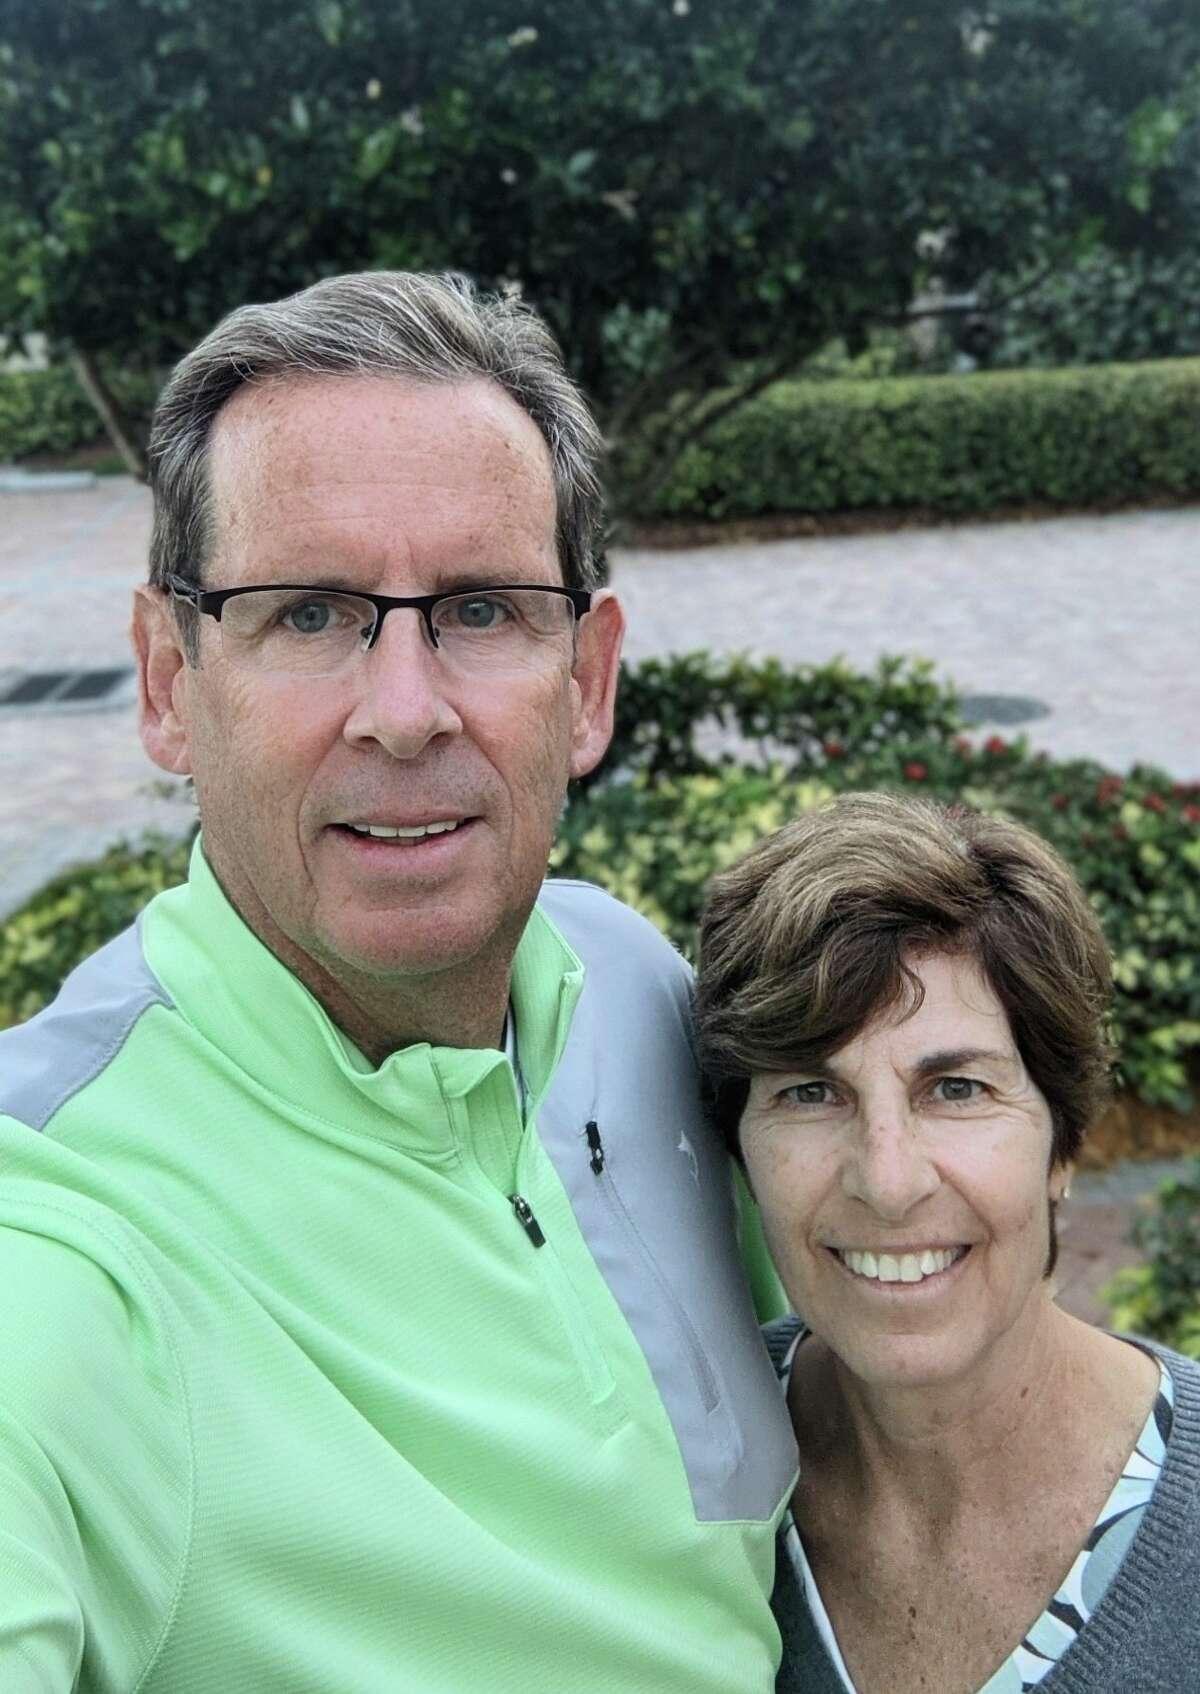 Mike and Paula Freed